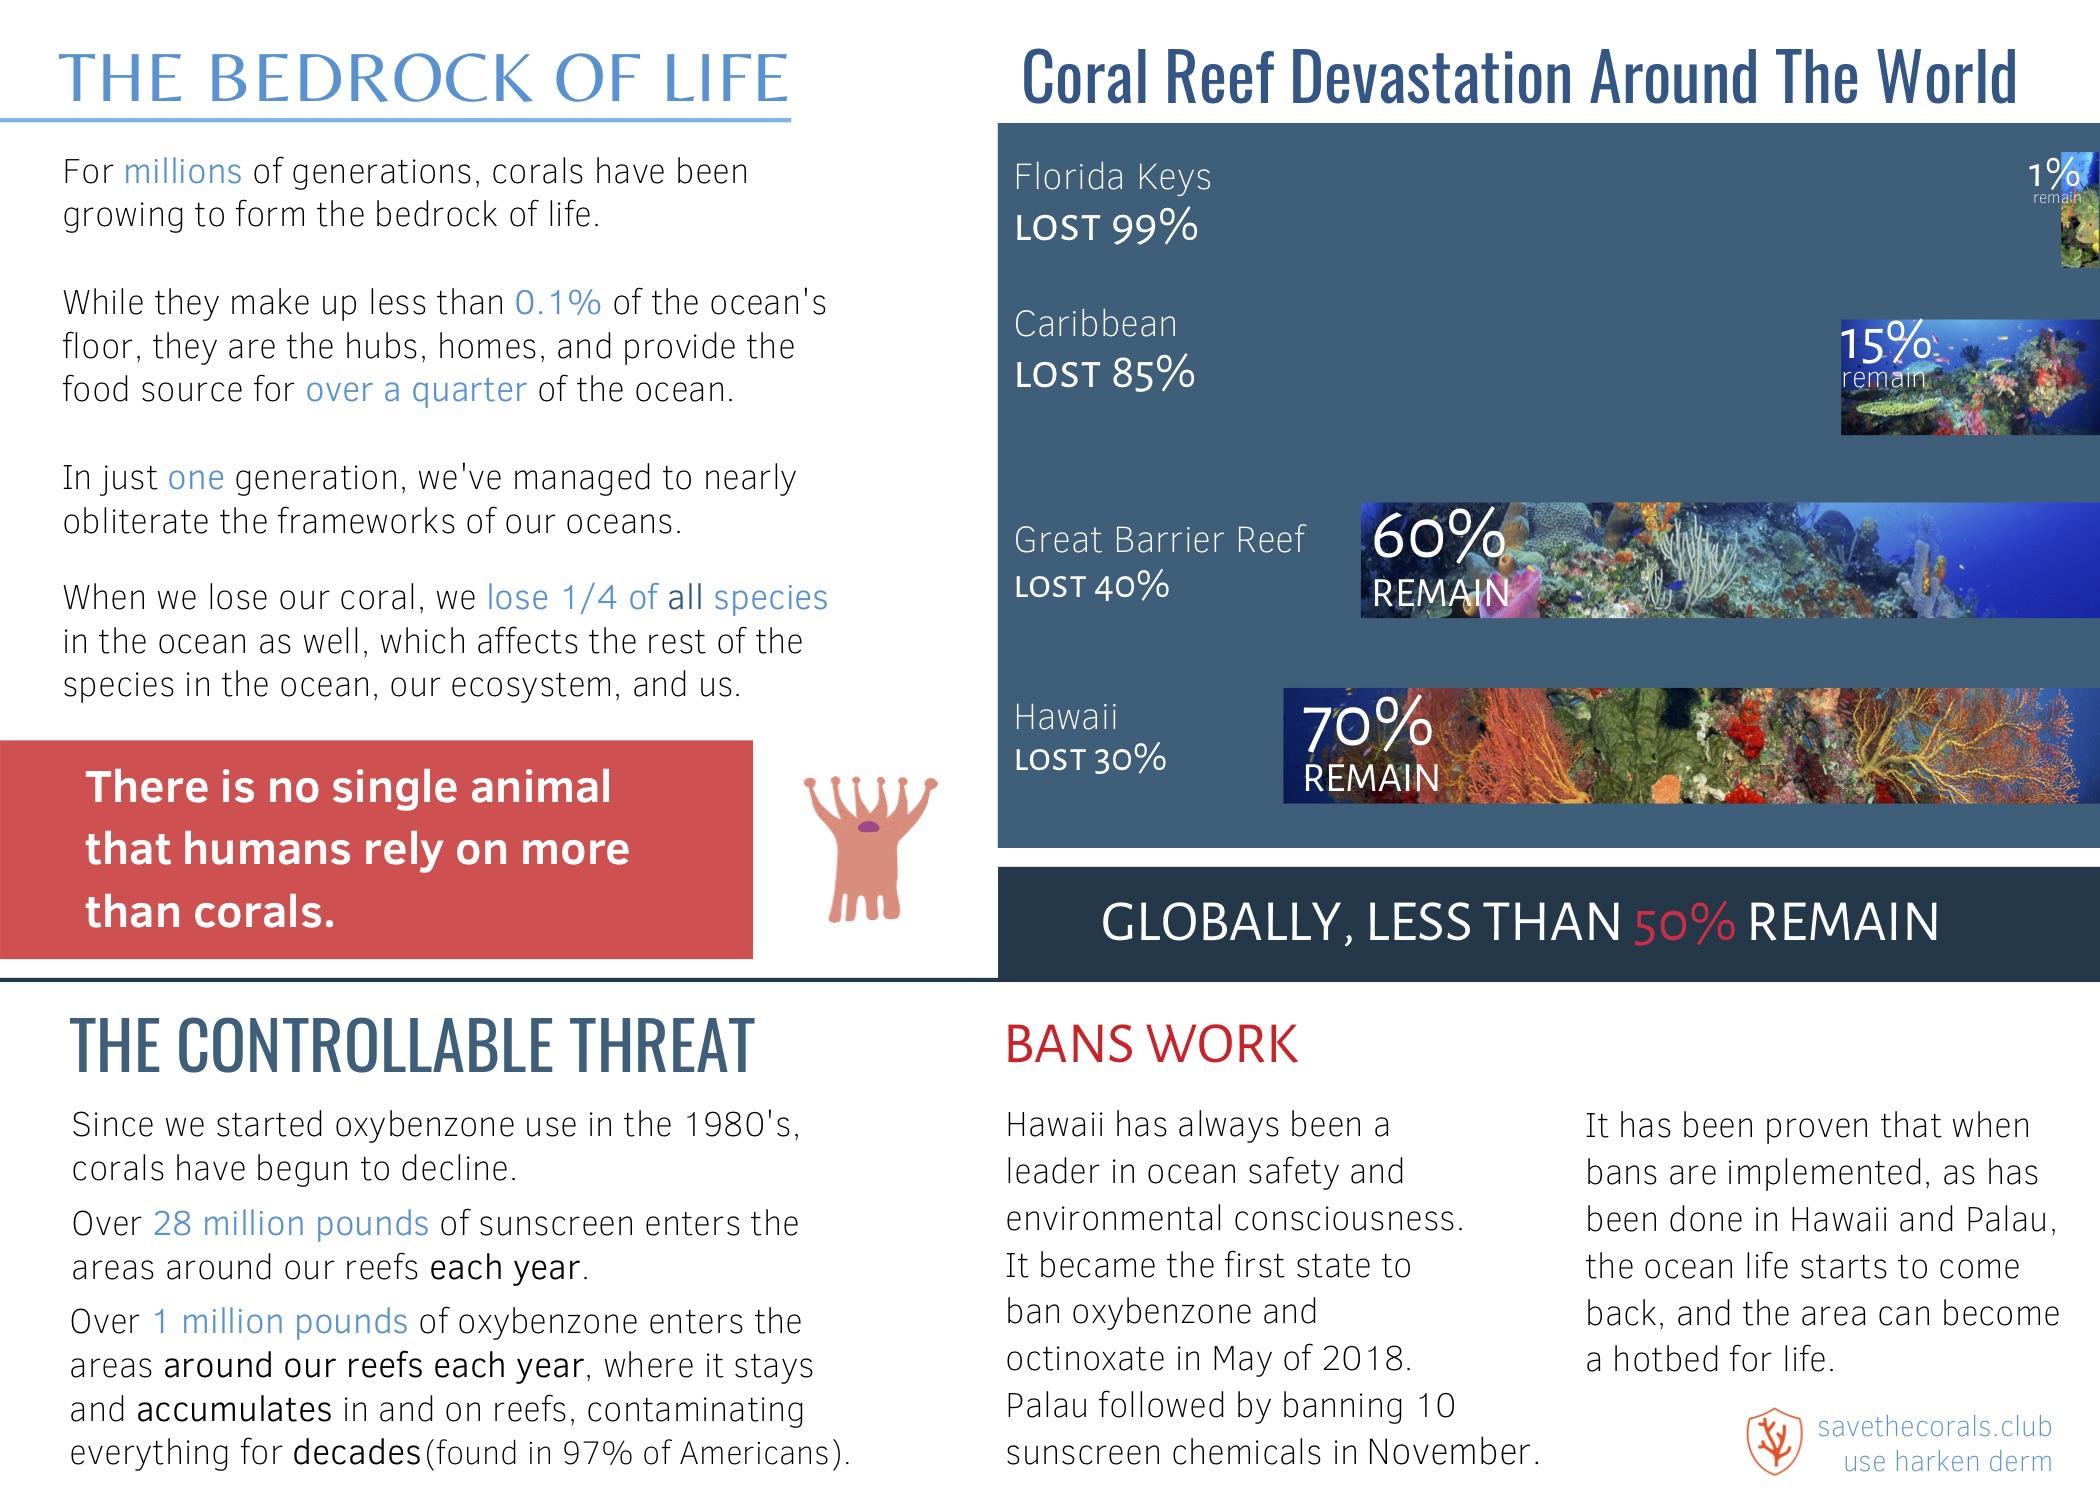 coral postcard-harken derm-coral decline-postcard back.jpg